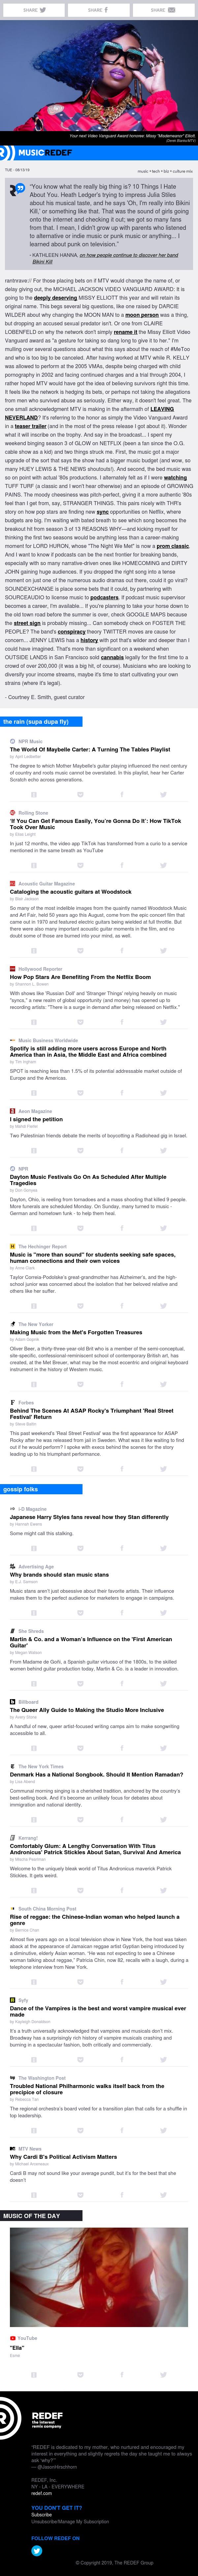 jason hirschhorn's @MusicREDEF: 08/13/2019 - Missy Elliott on the Vanguard, Maybelle Carter, Tik Tok, Acoustic Woodstock, Netflix's Gift to Music...